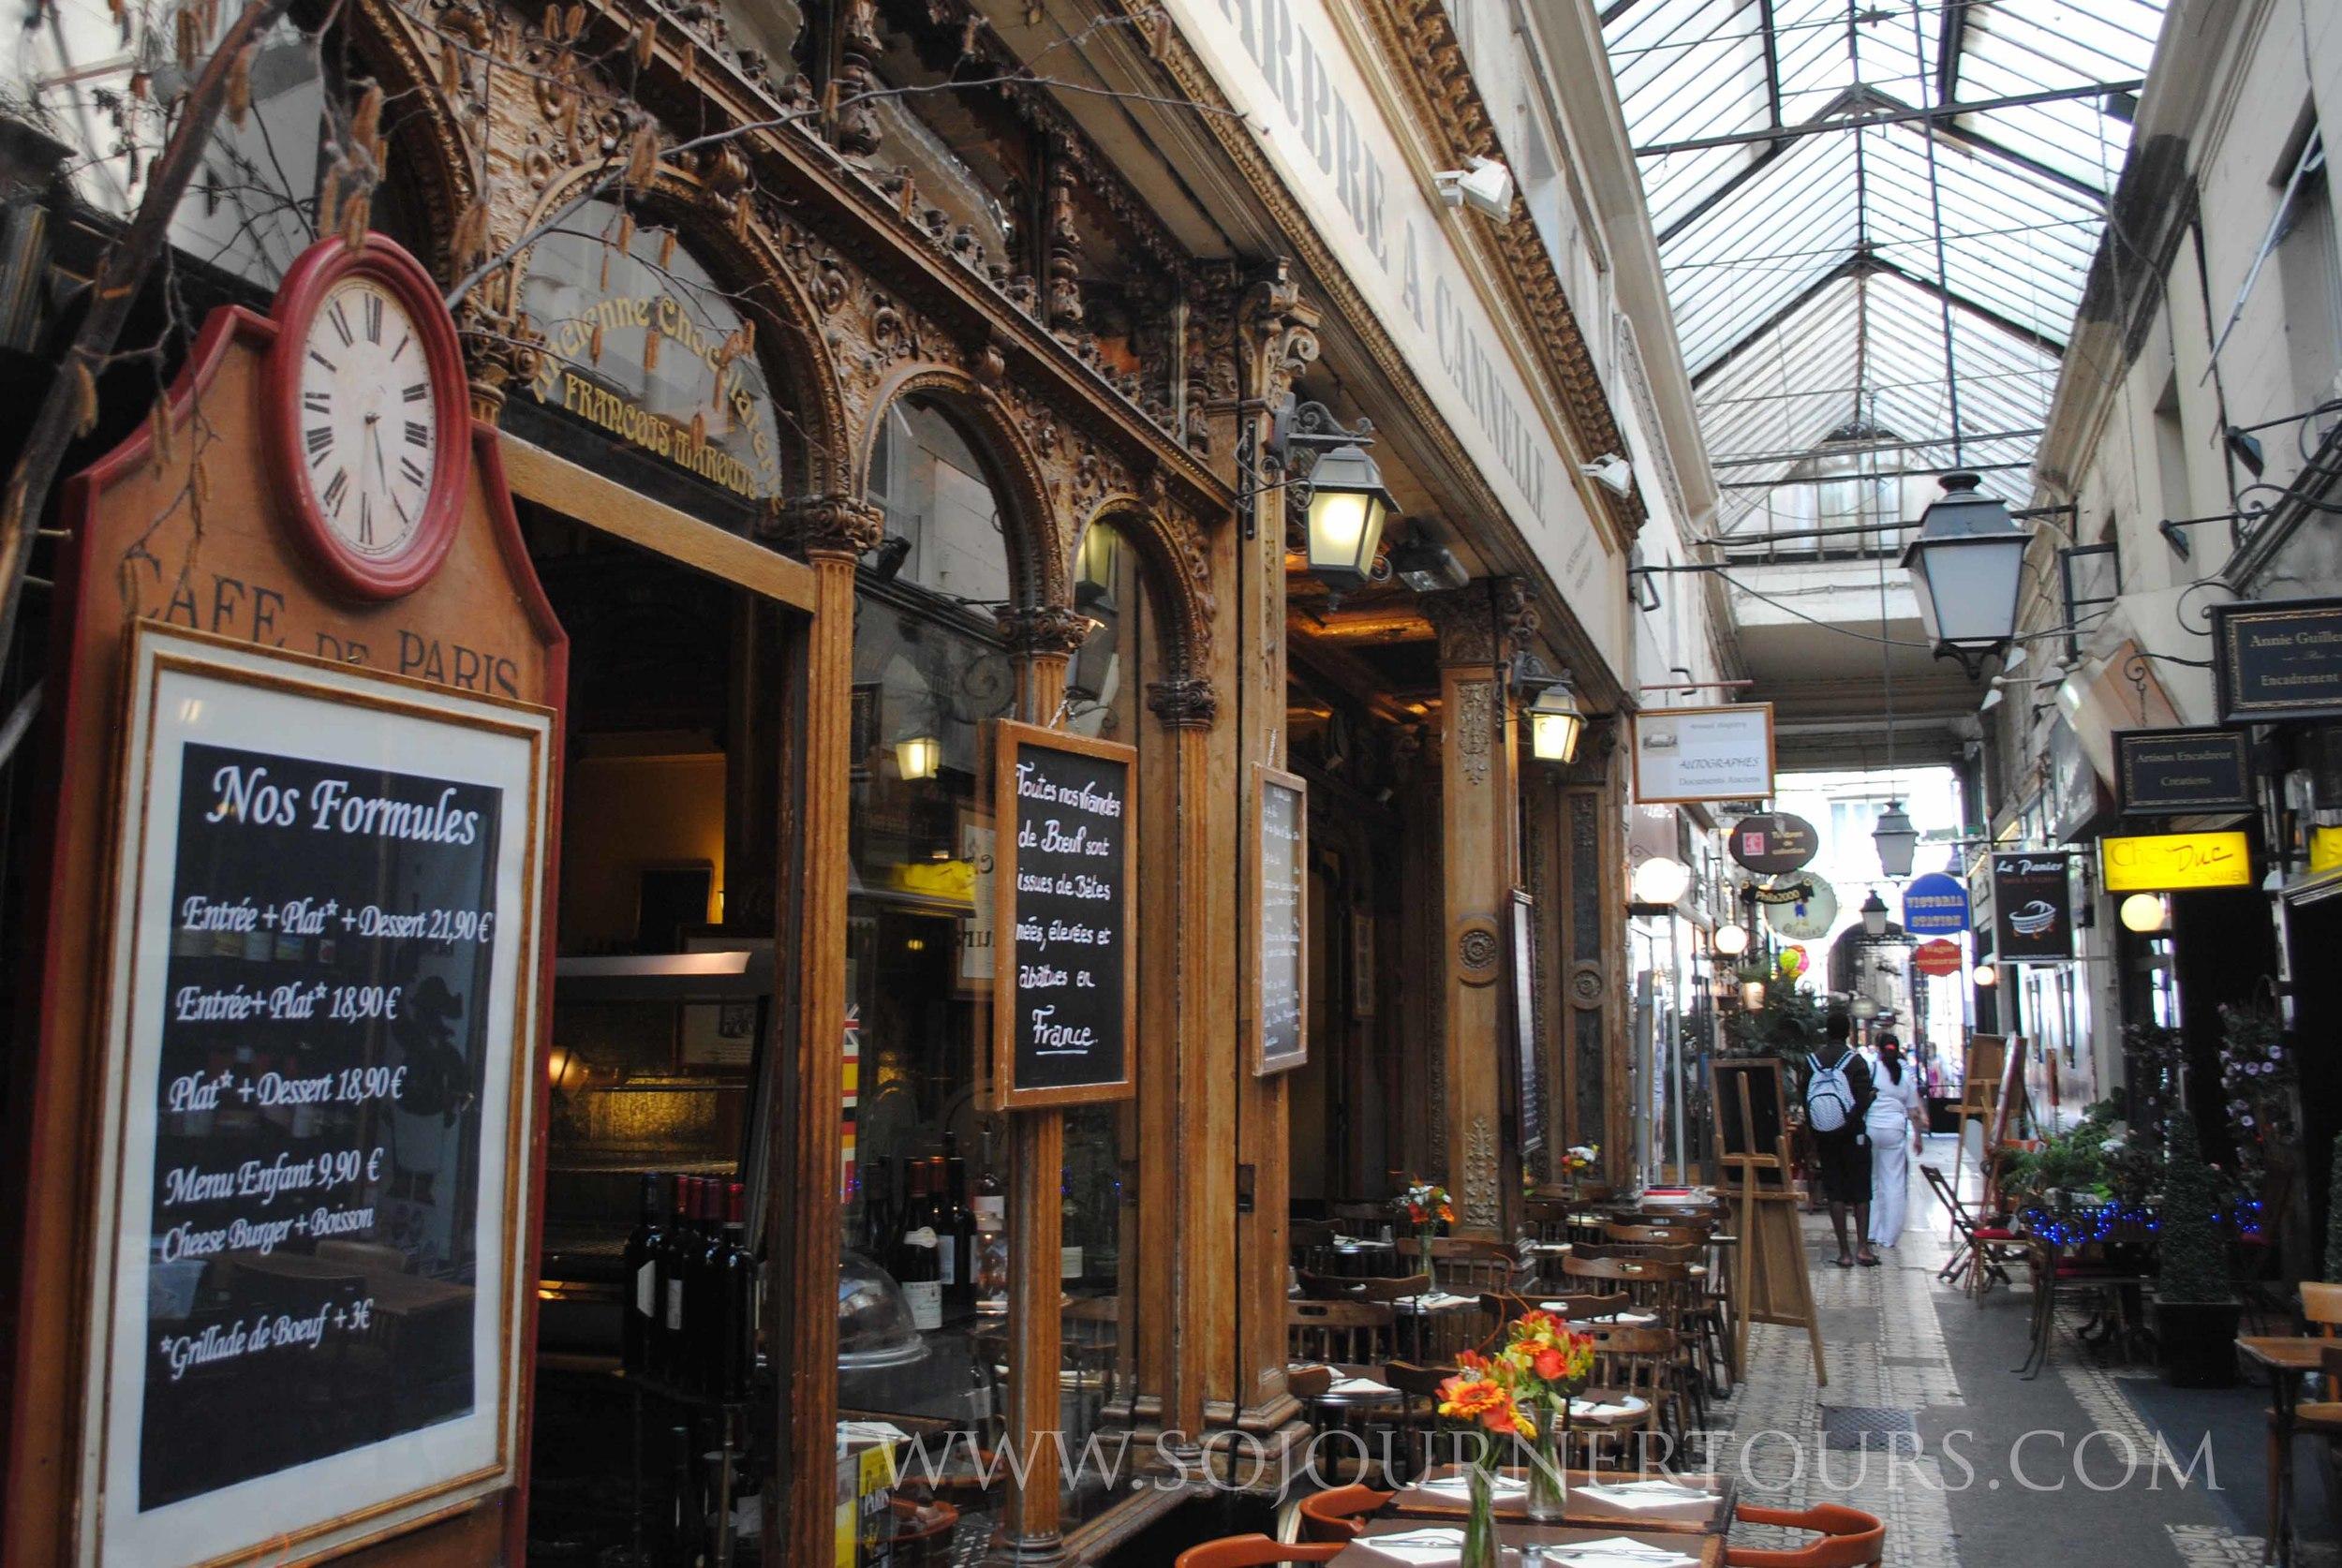 Covered Passage des Panoramas: Paris, France (Sojourner Tours)